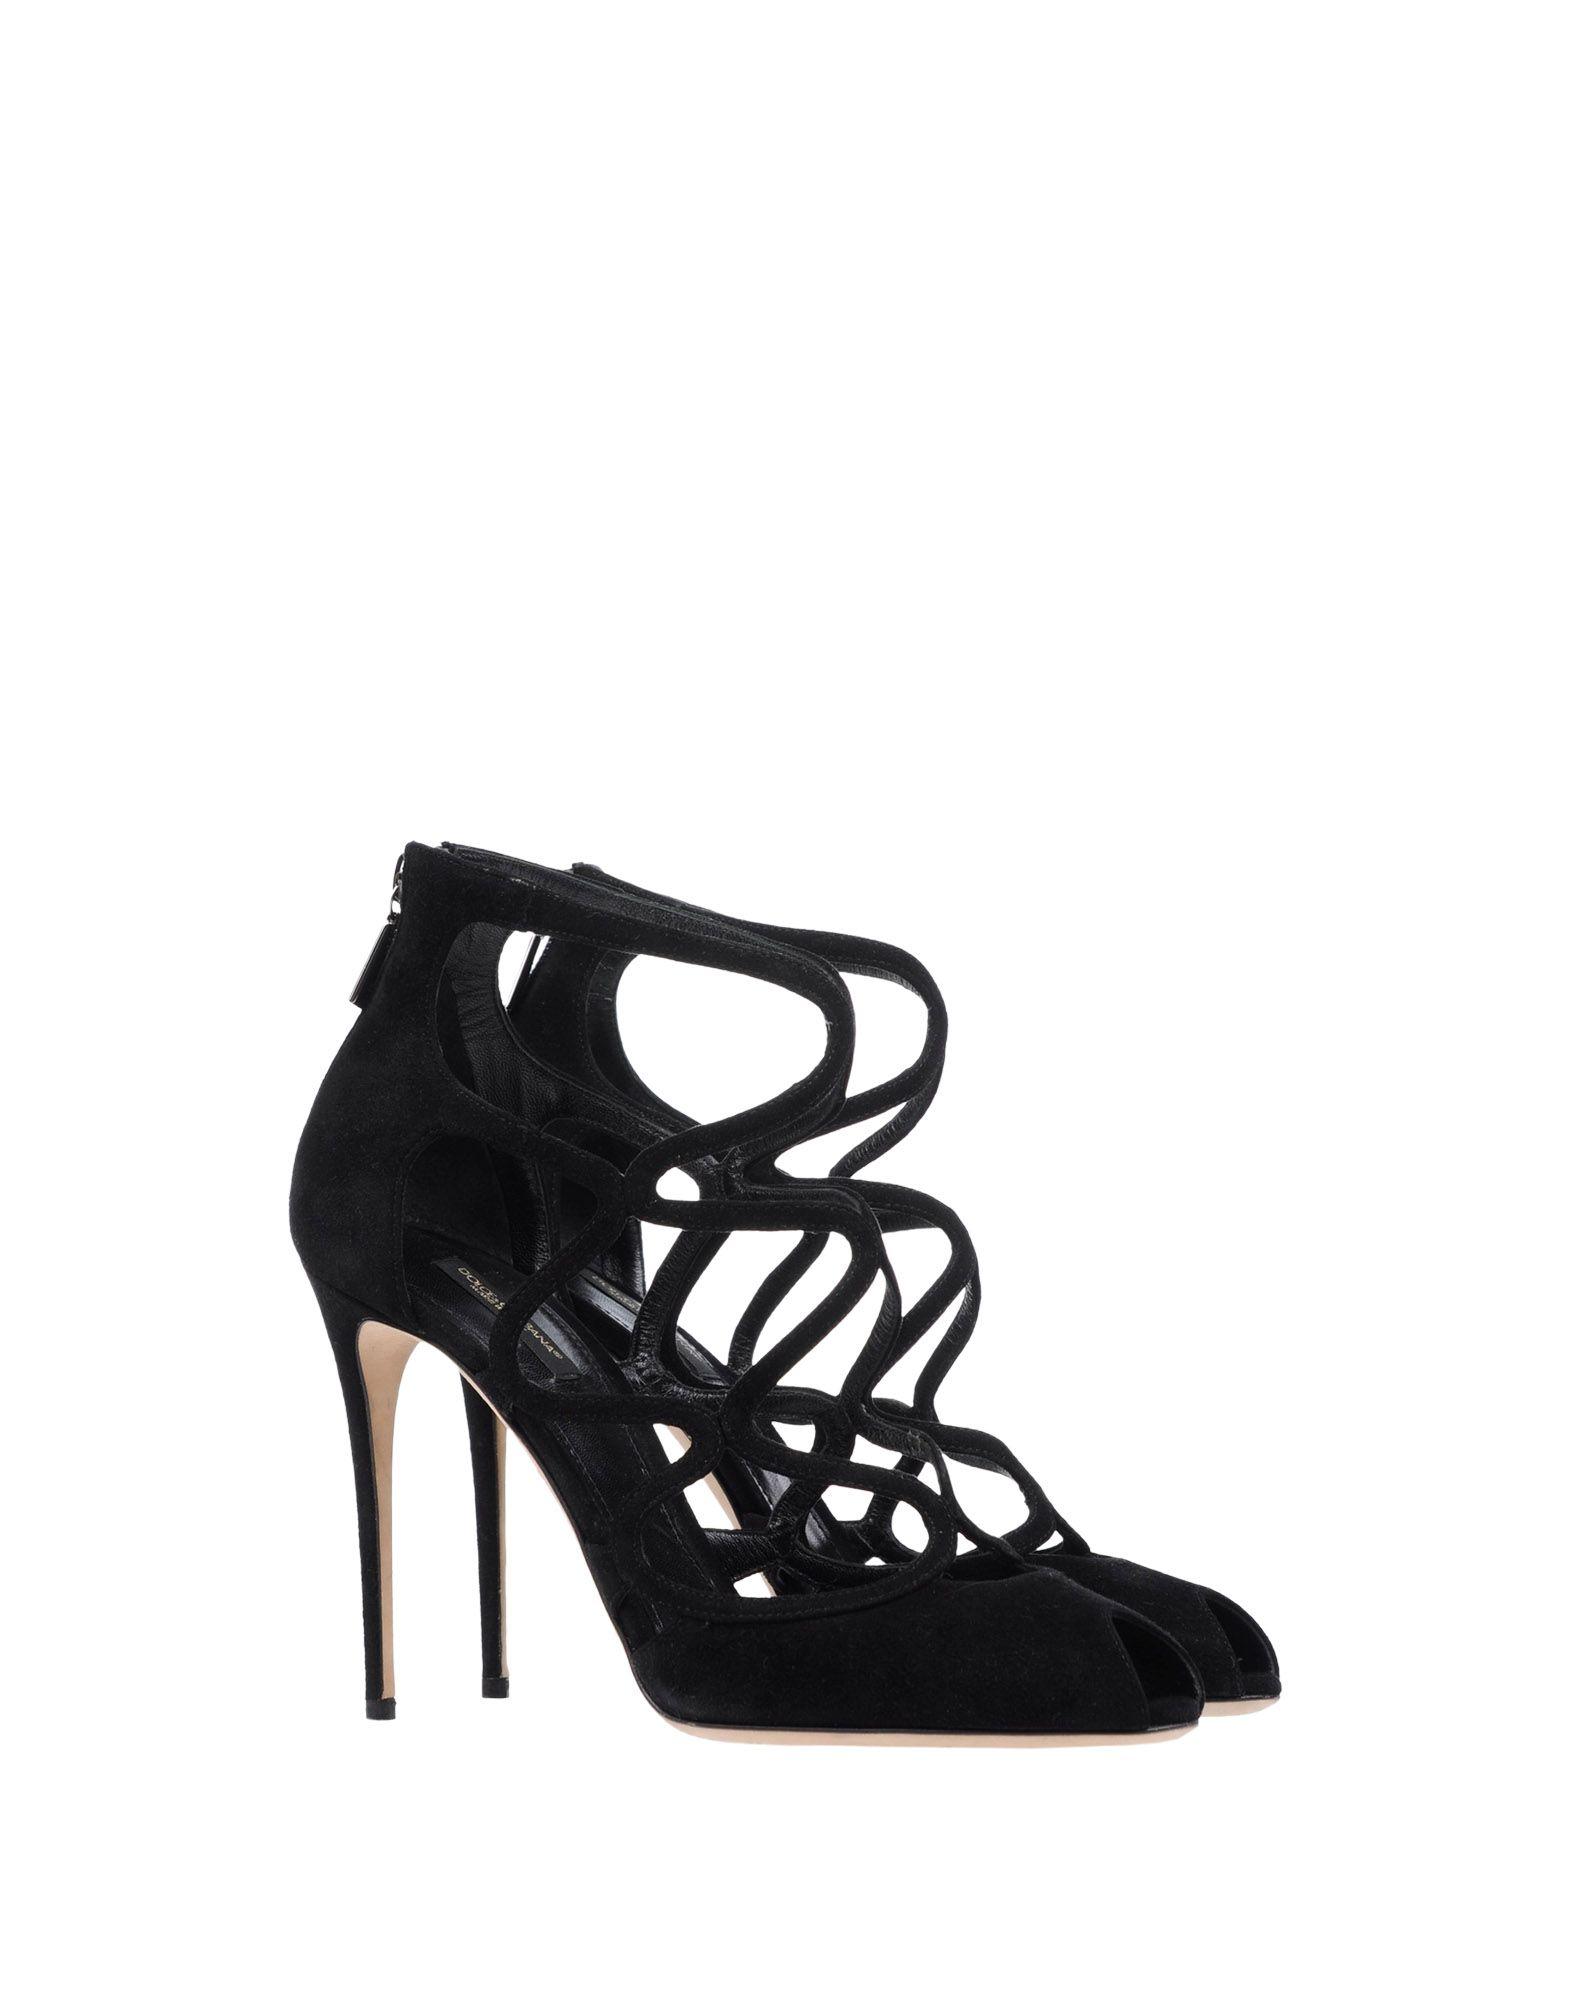 Escarpins Dolce & Gabbana Femme - Escarpins Dolce & Gabbana sur